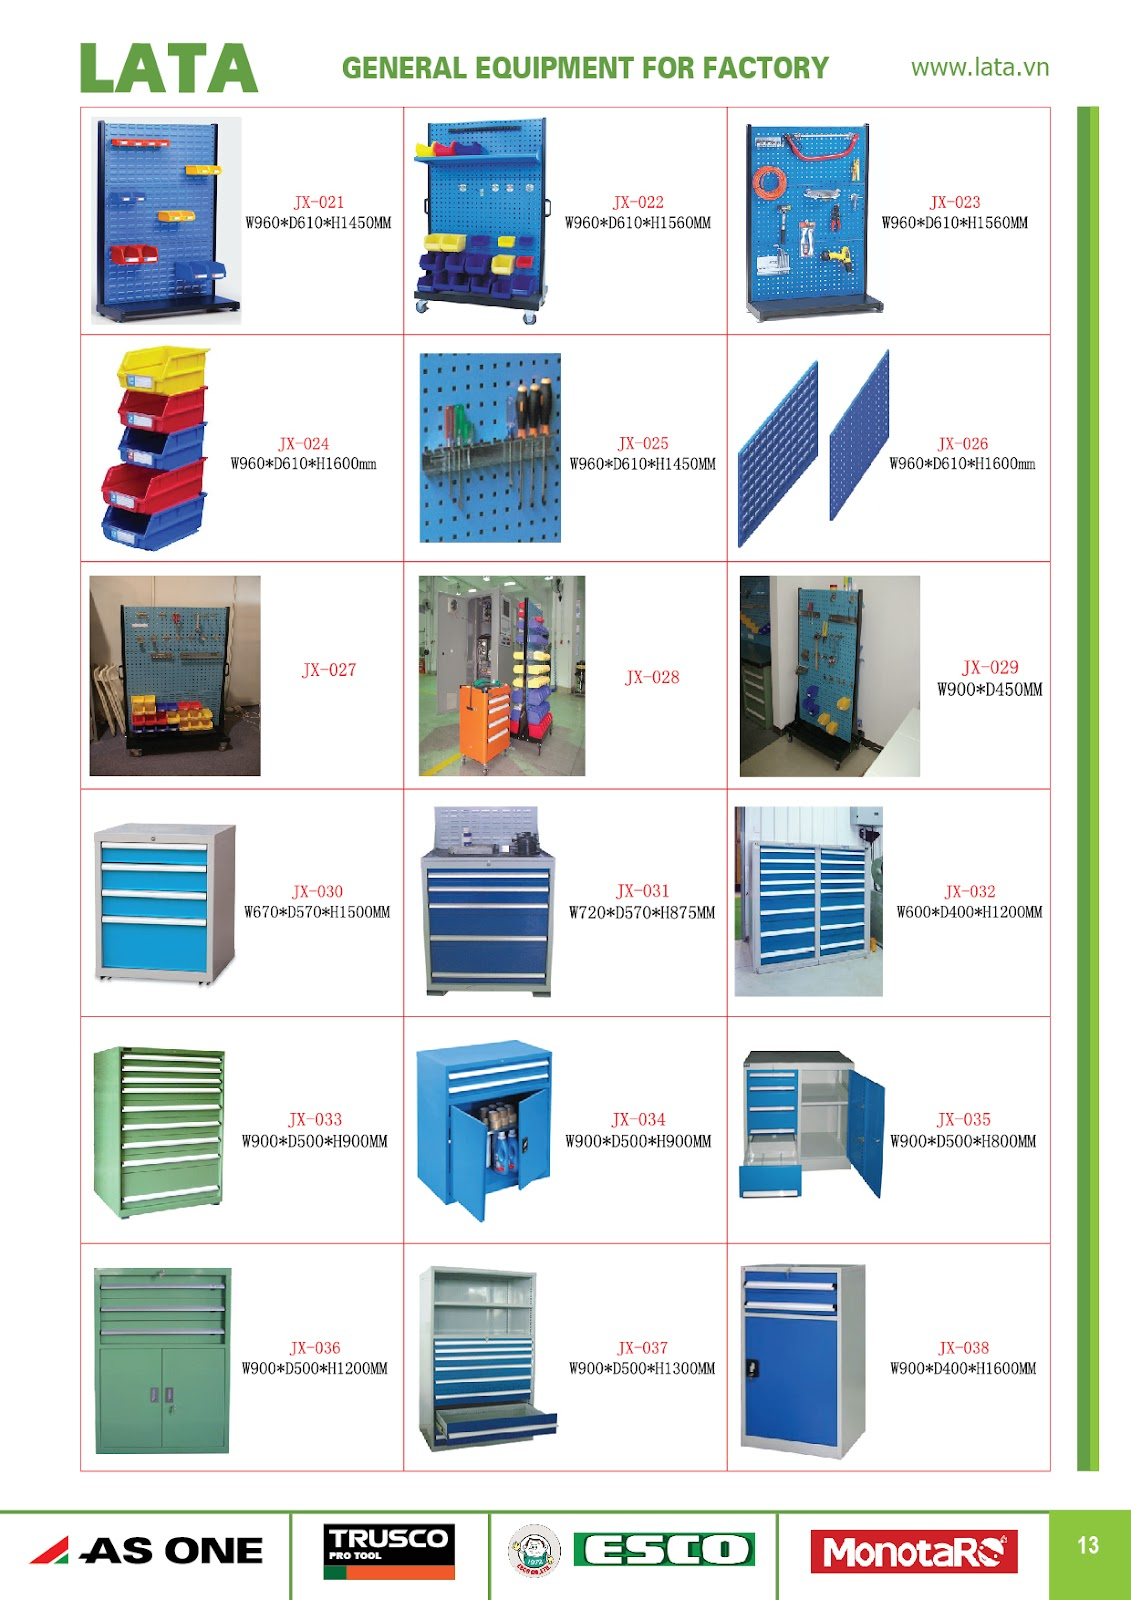 Catalogue LATA (T11)_13.jpg